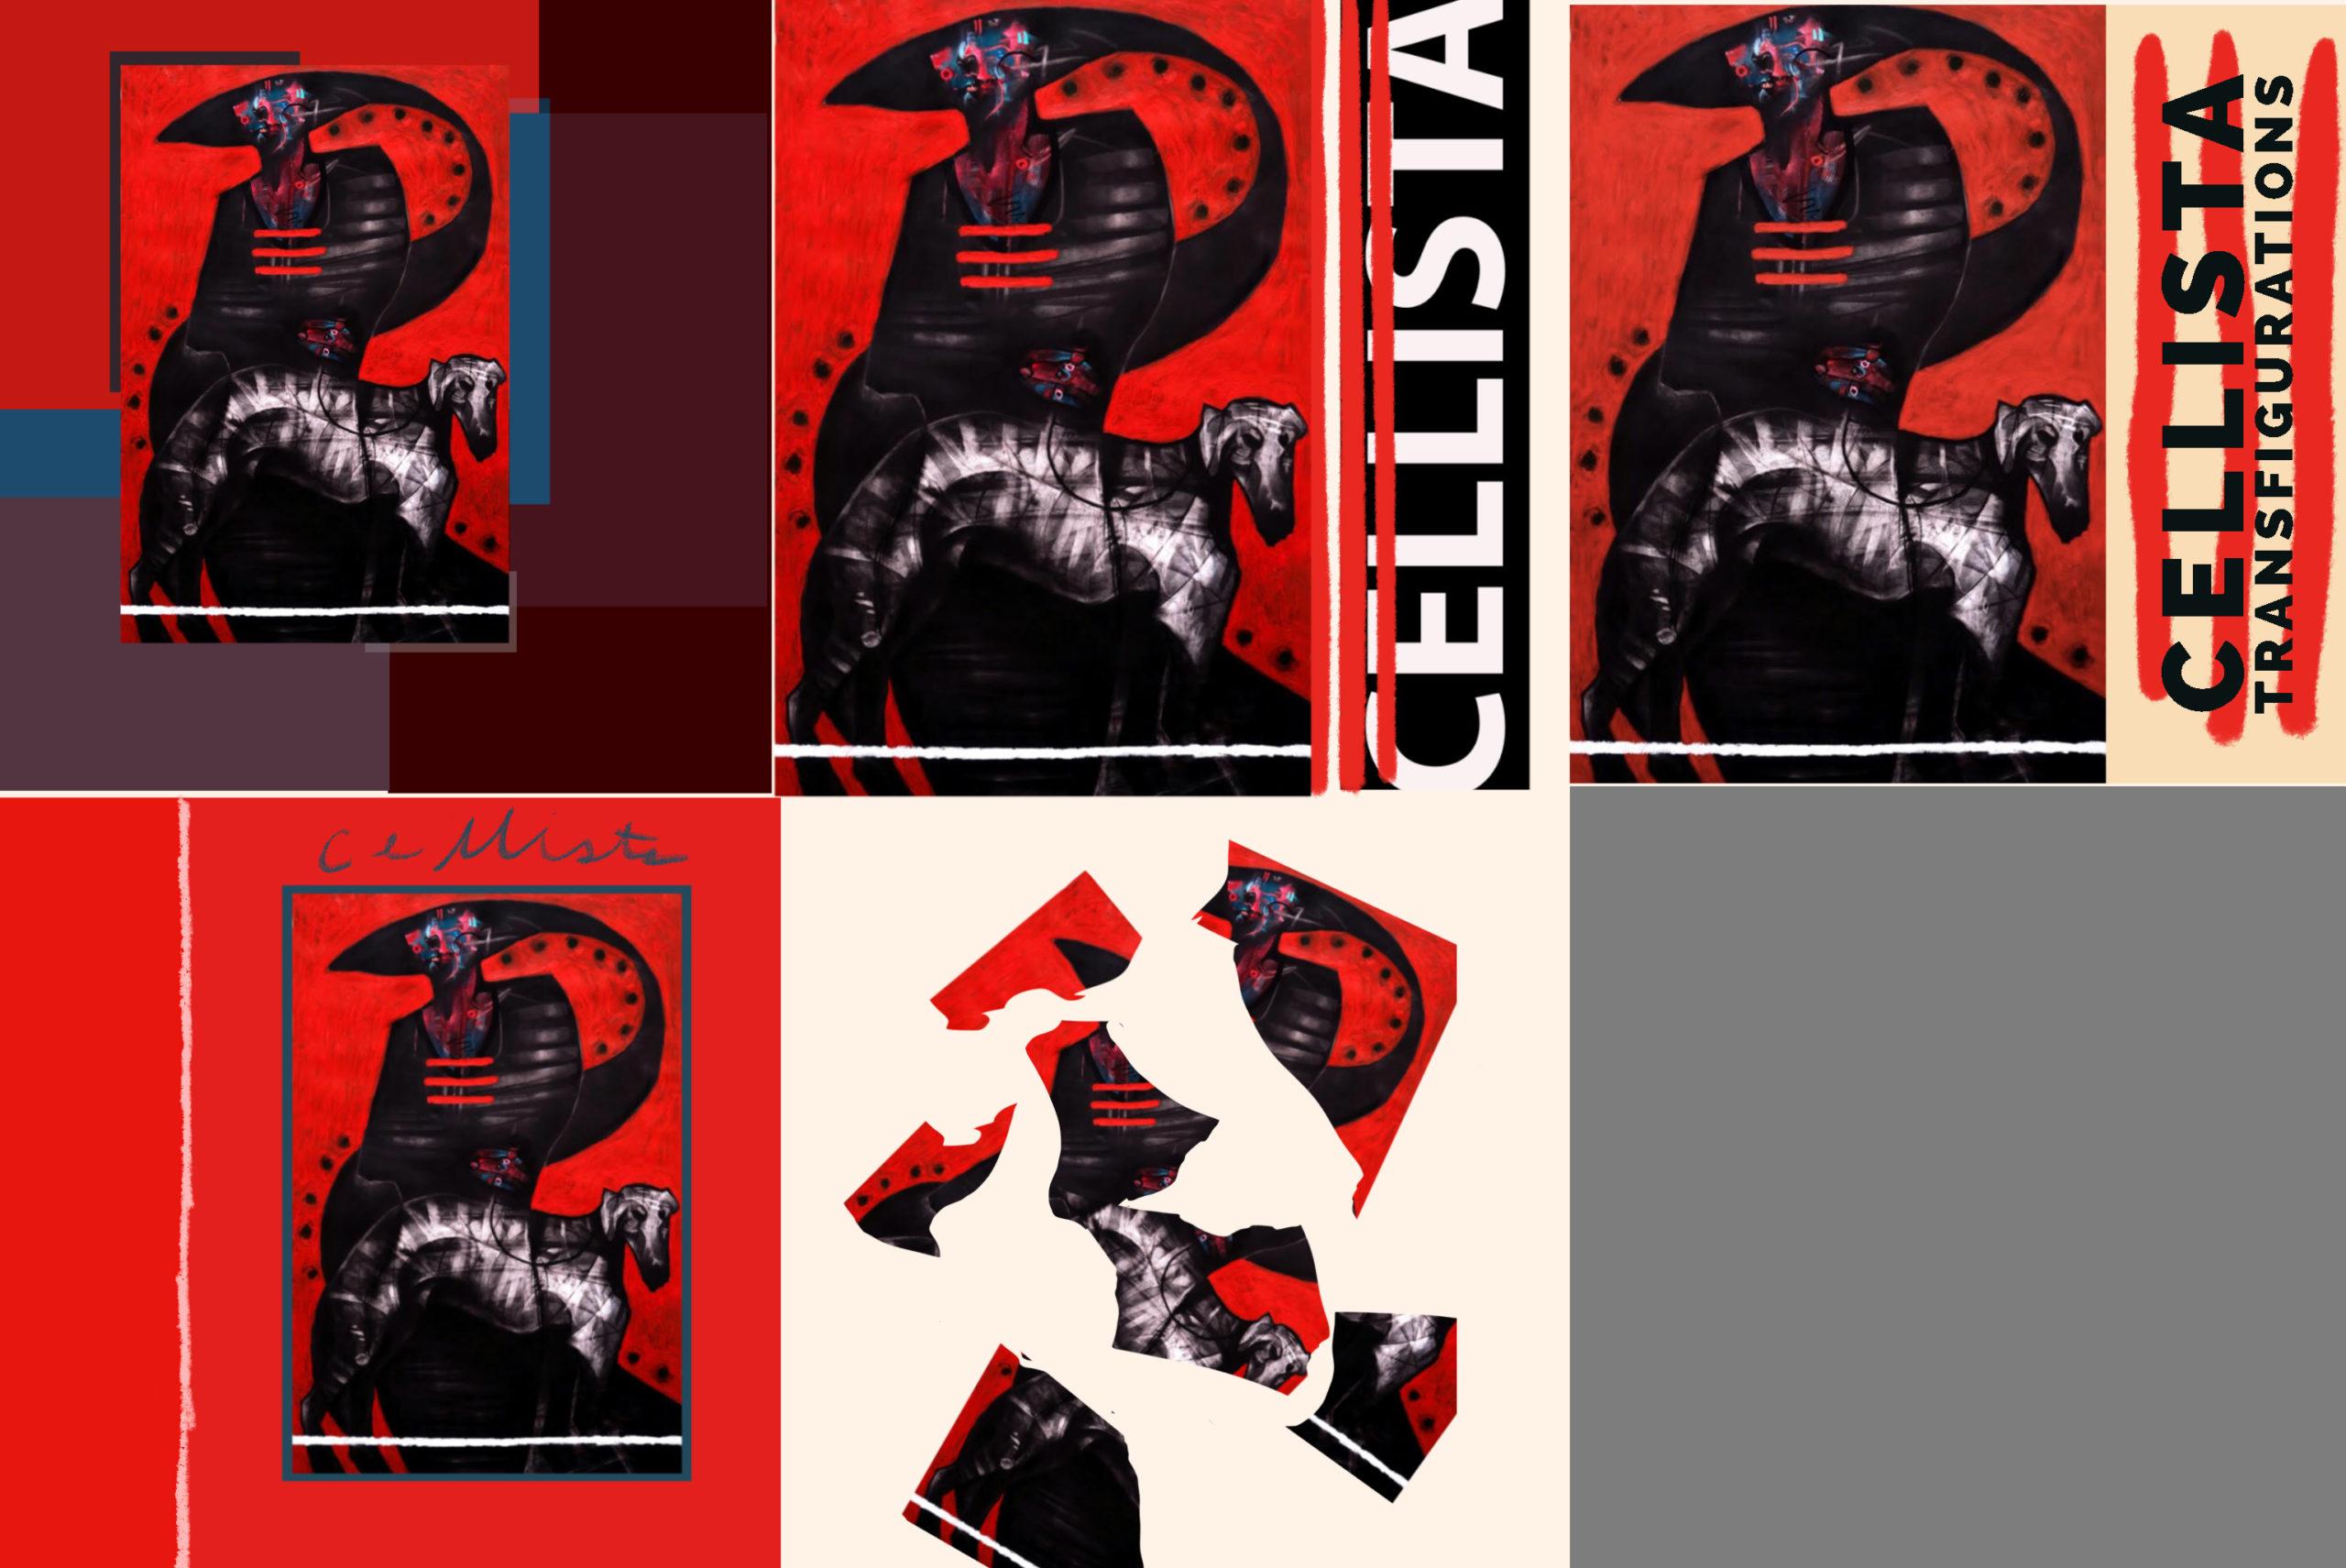 Cellista Album process images